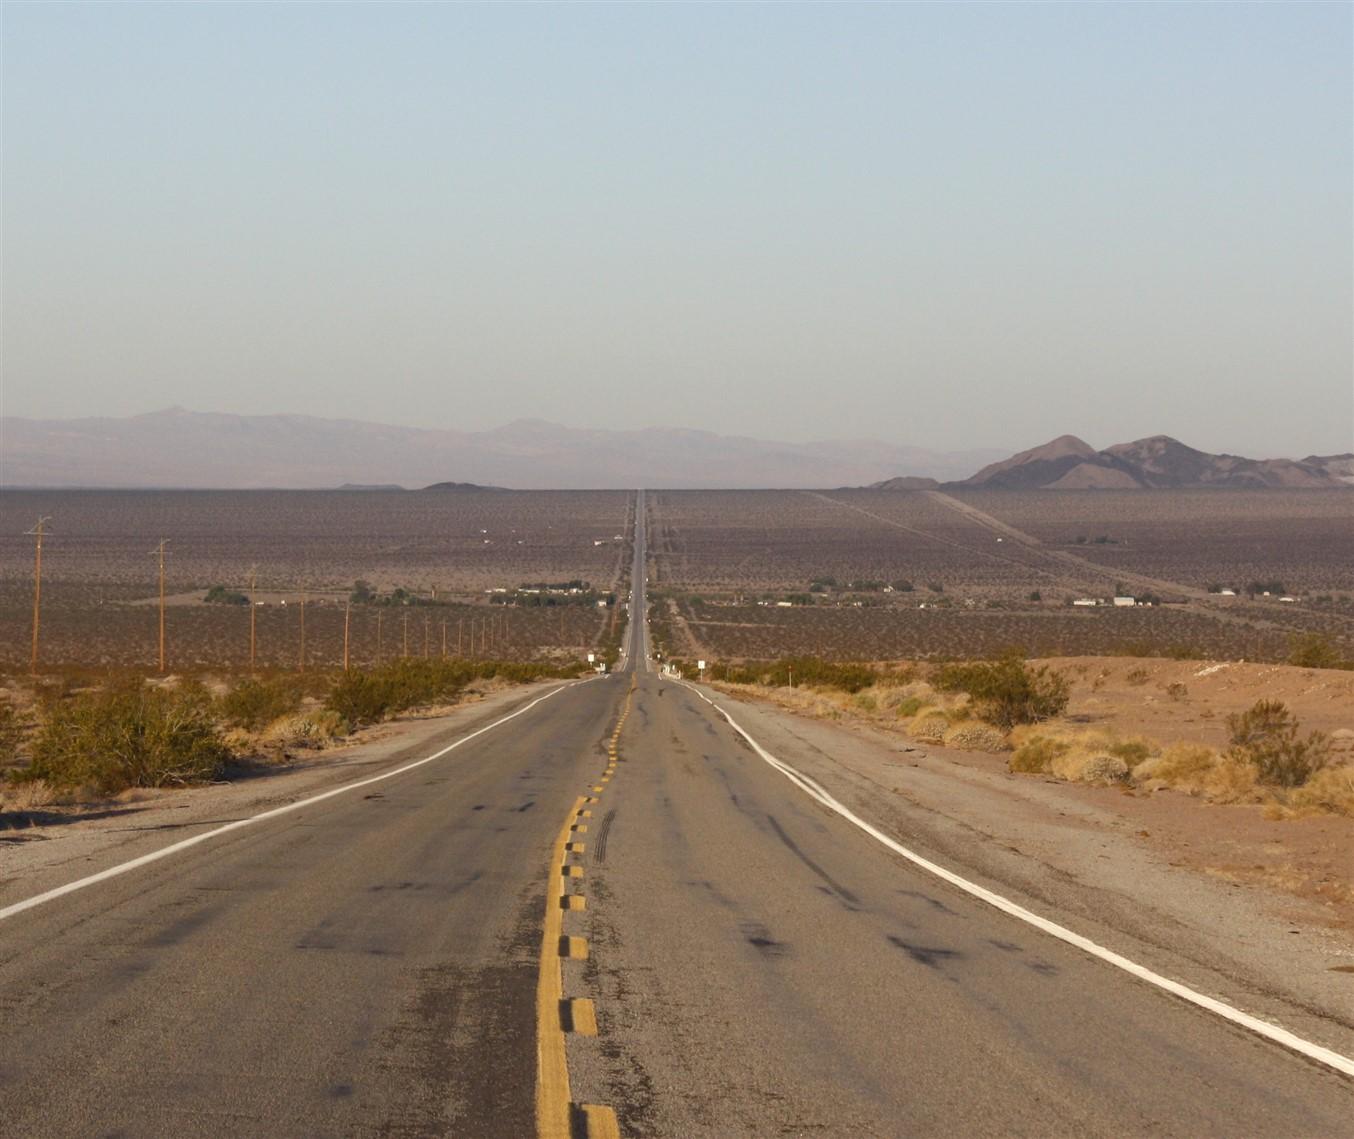 2012 03 14 Route 66 Road Trip 30 California Desert.jpg